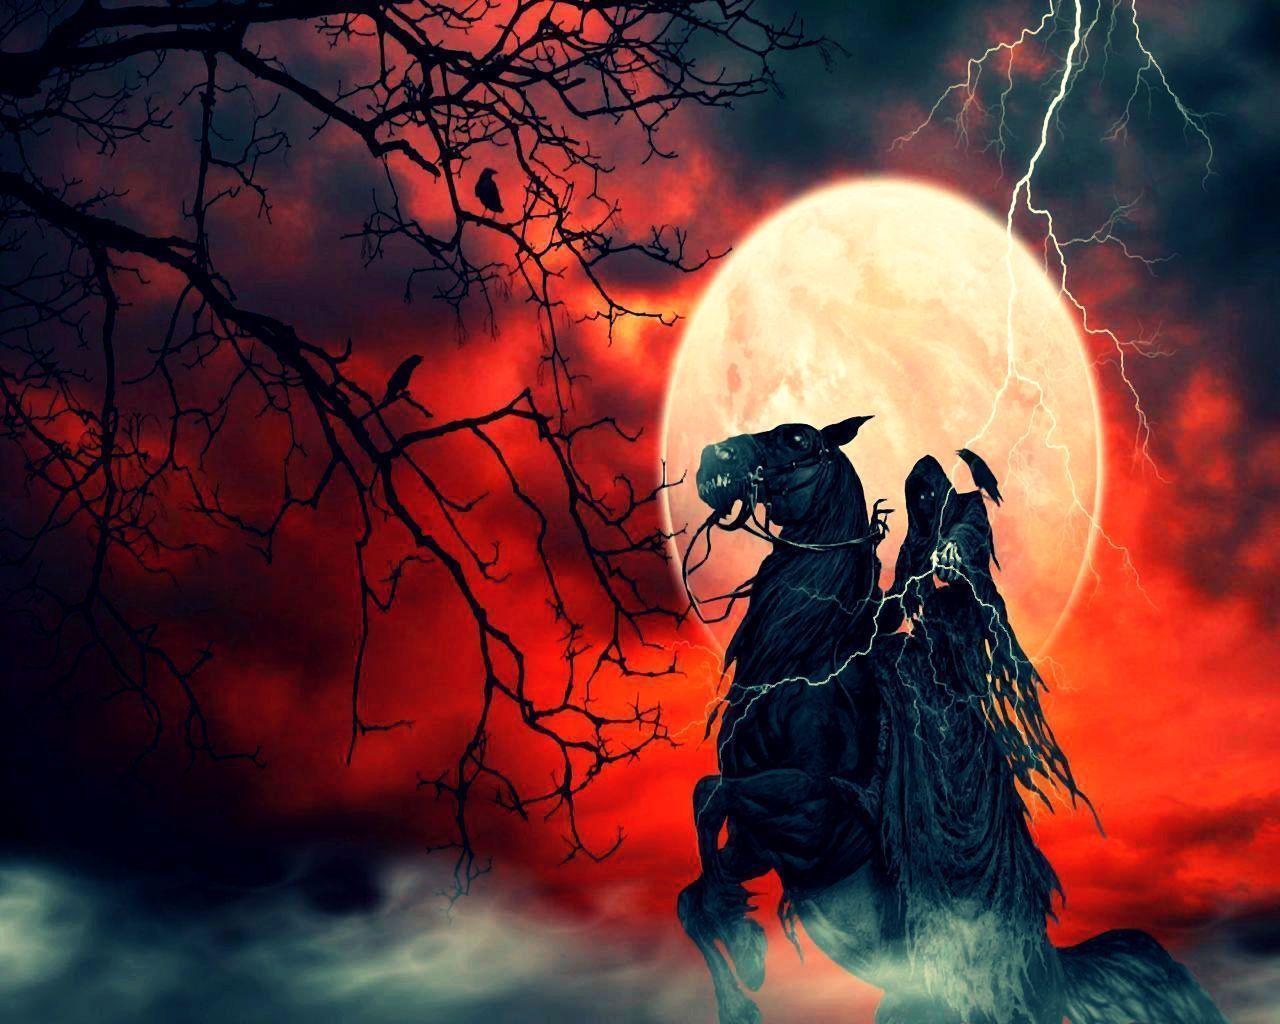 Grim Reaper Wallpapers on